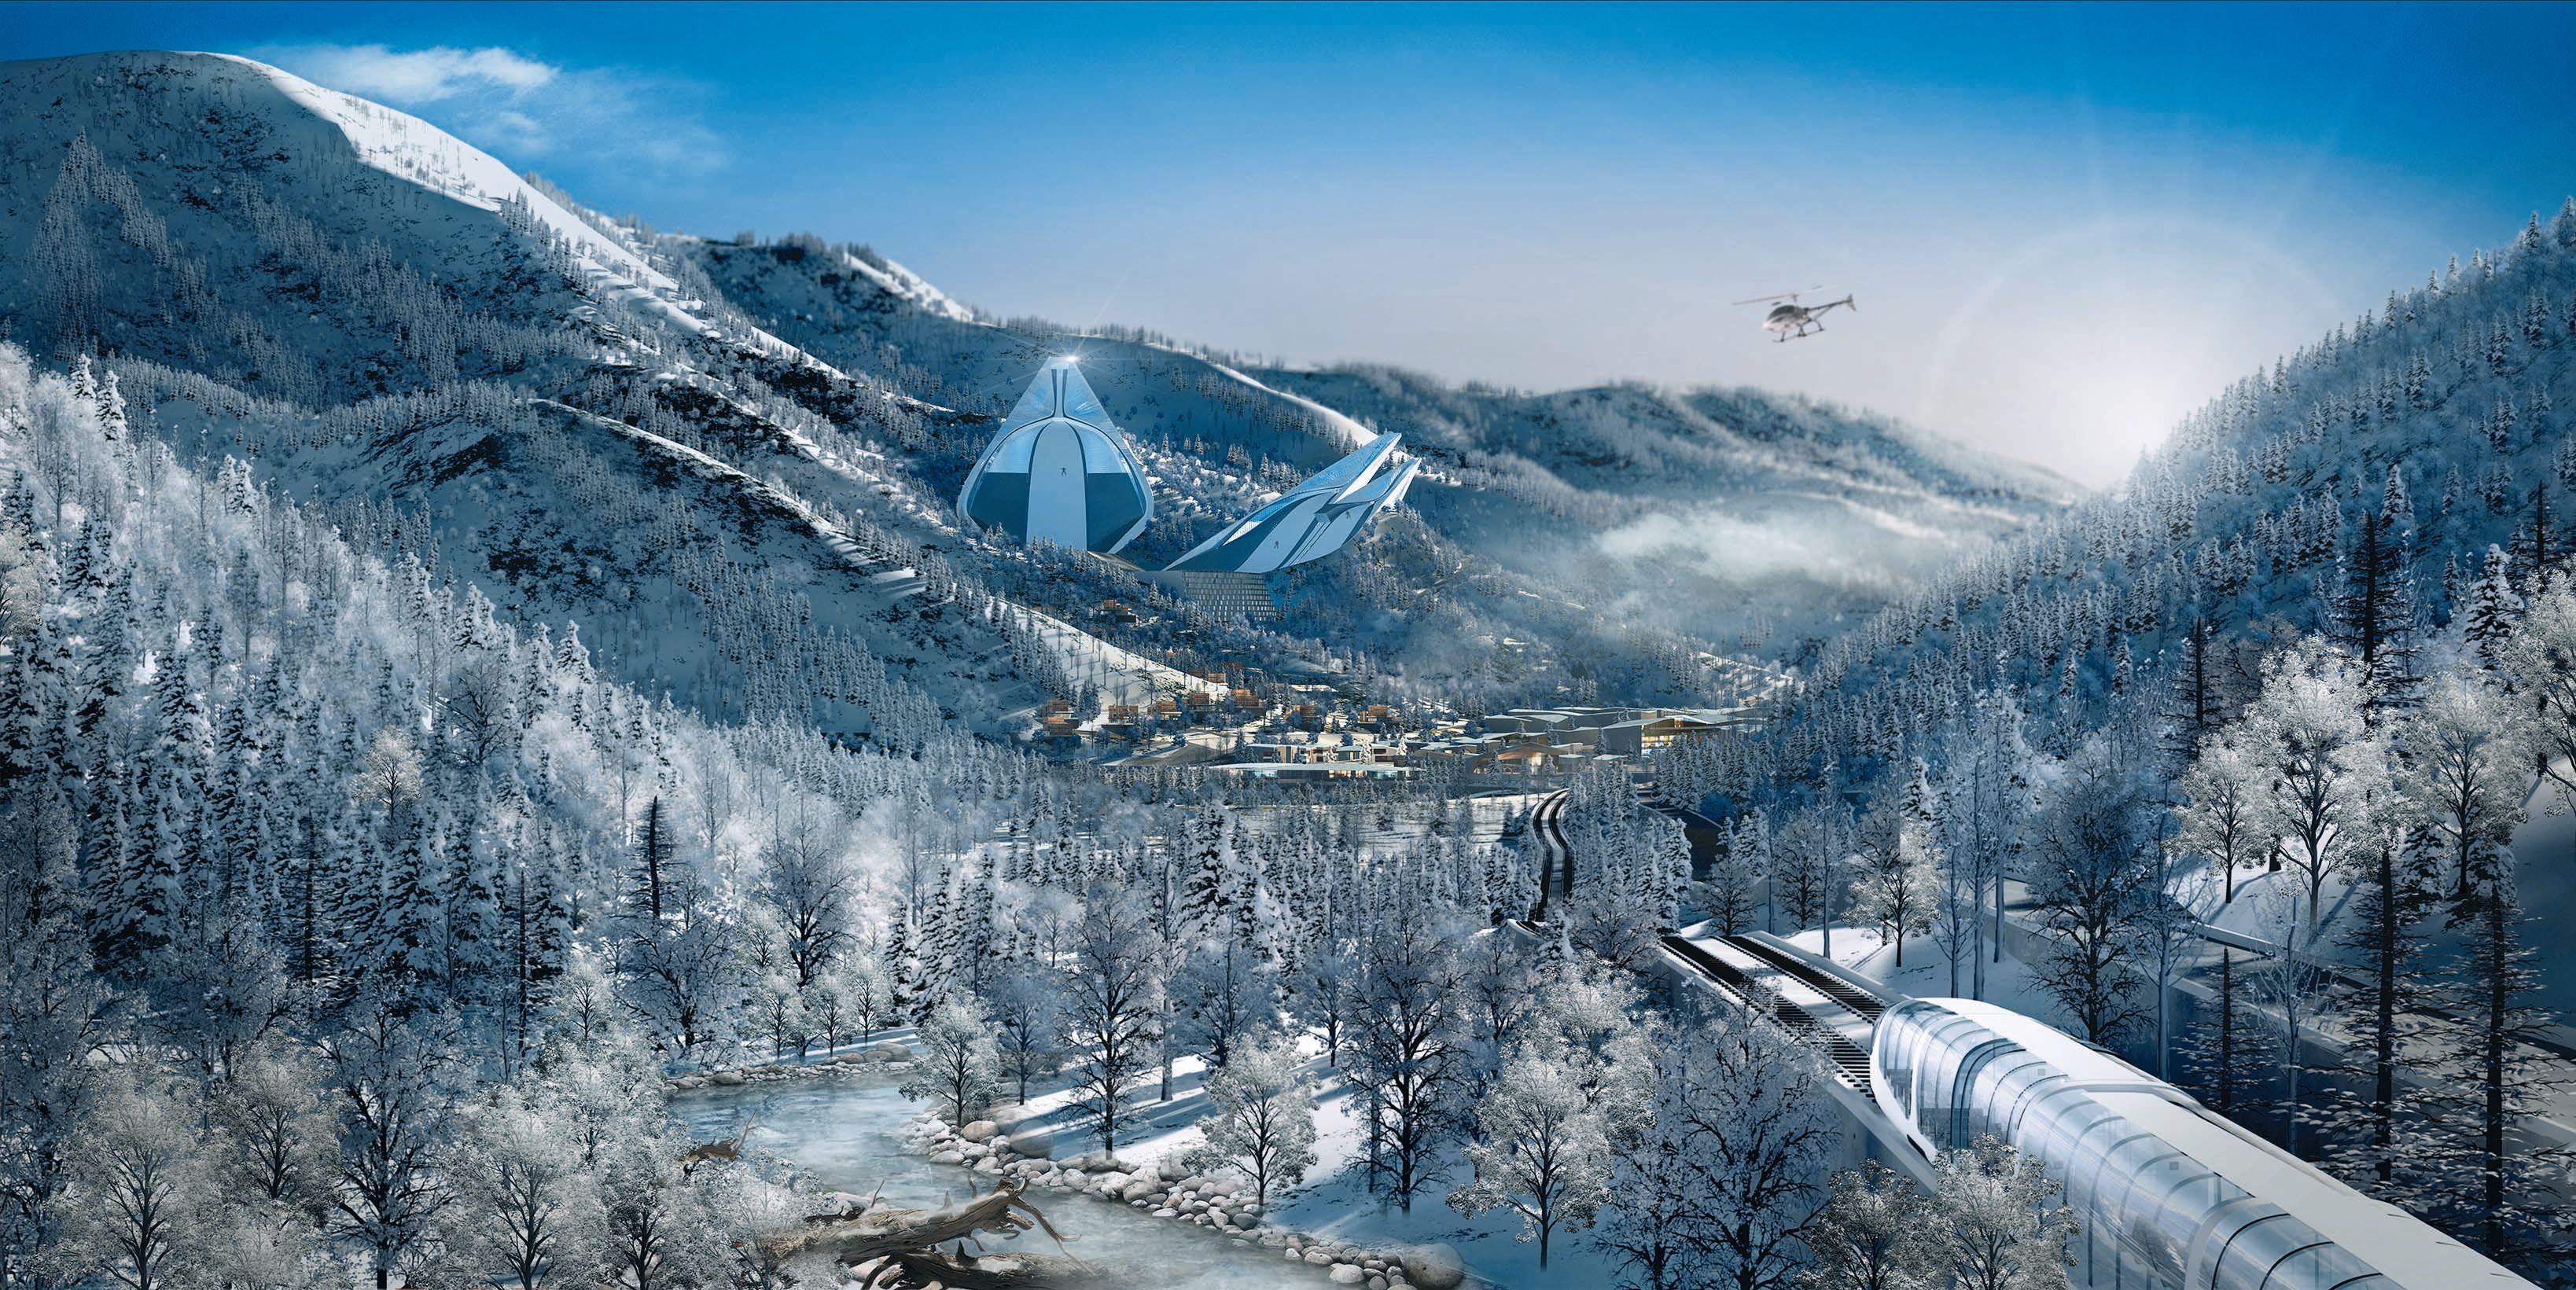 Changbaishan Ski Jumps